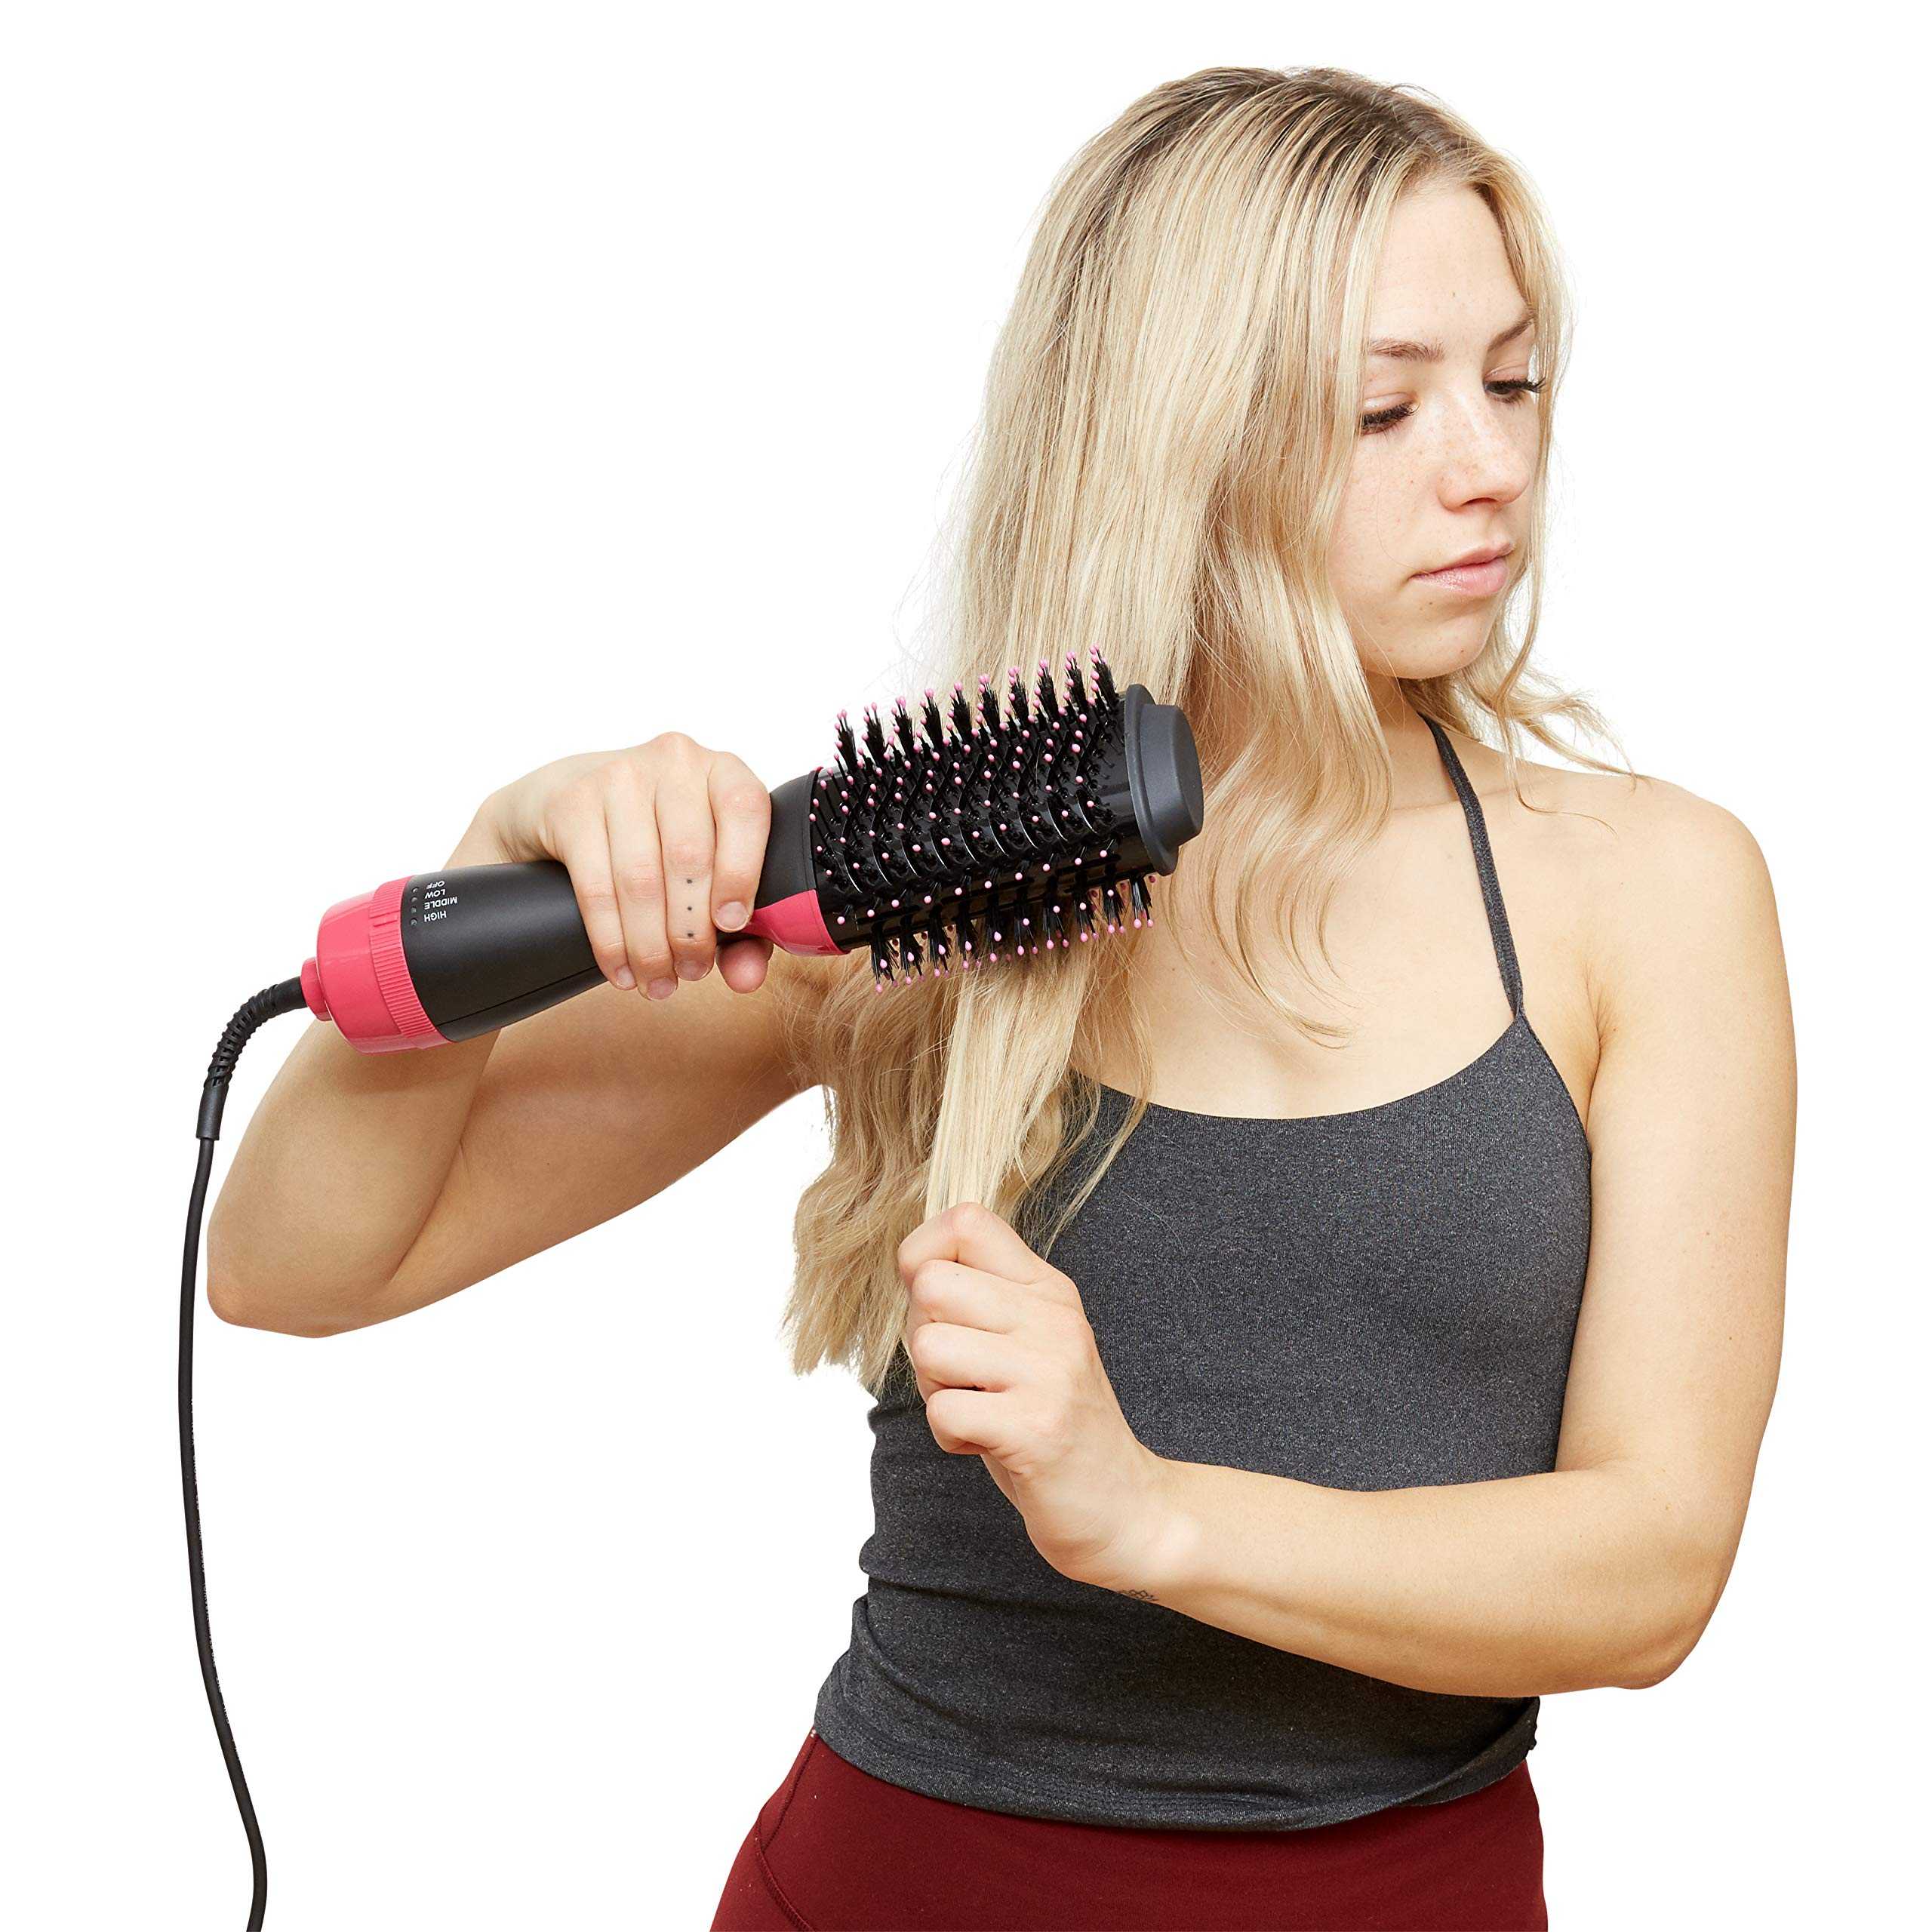 Beauty Hair Brush Dryer - Hairdryer/Straightener/Blowdryer/Volume/Straightening/Styling - Blow Dryers - Hot Volumizing Hairbrush - Amazing Salon Drying - Hair Blower - Volumize Hair dryer - Pro Styler by JJSparre